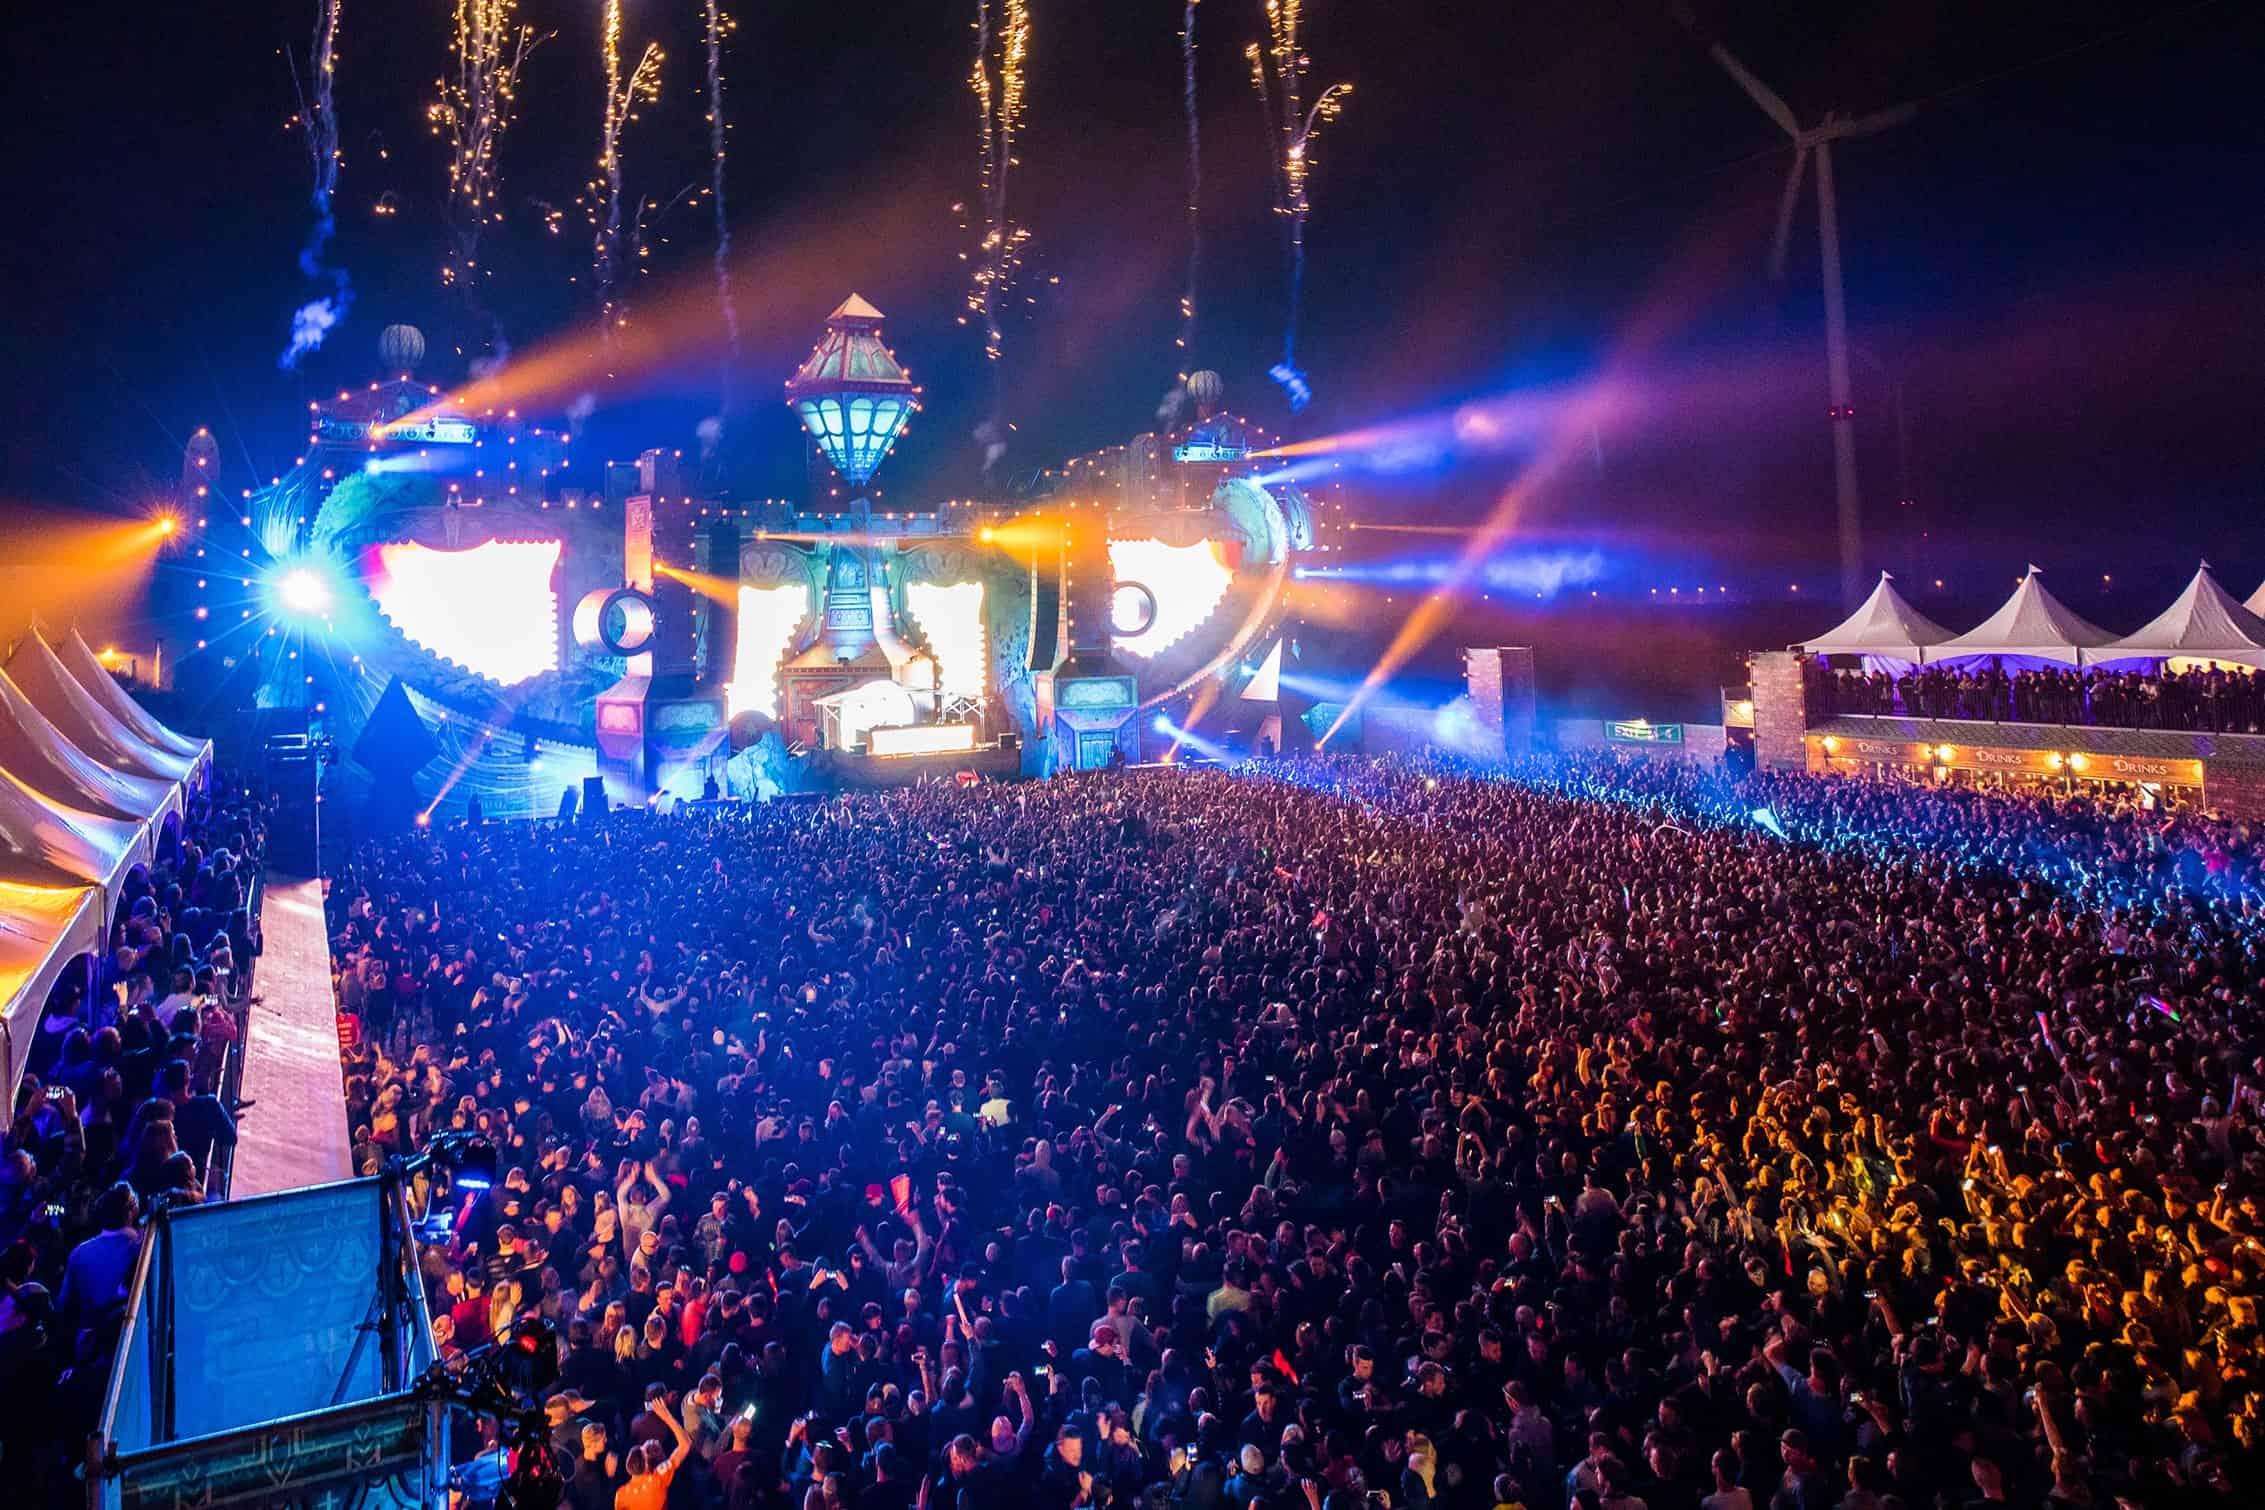 In Your Dreams Festival